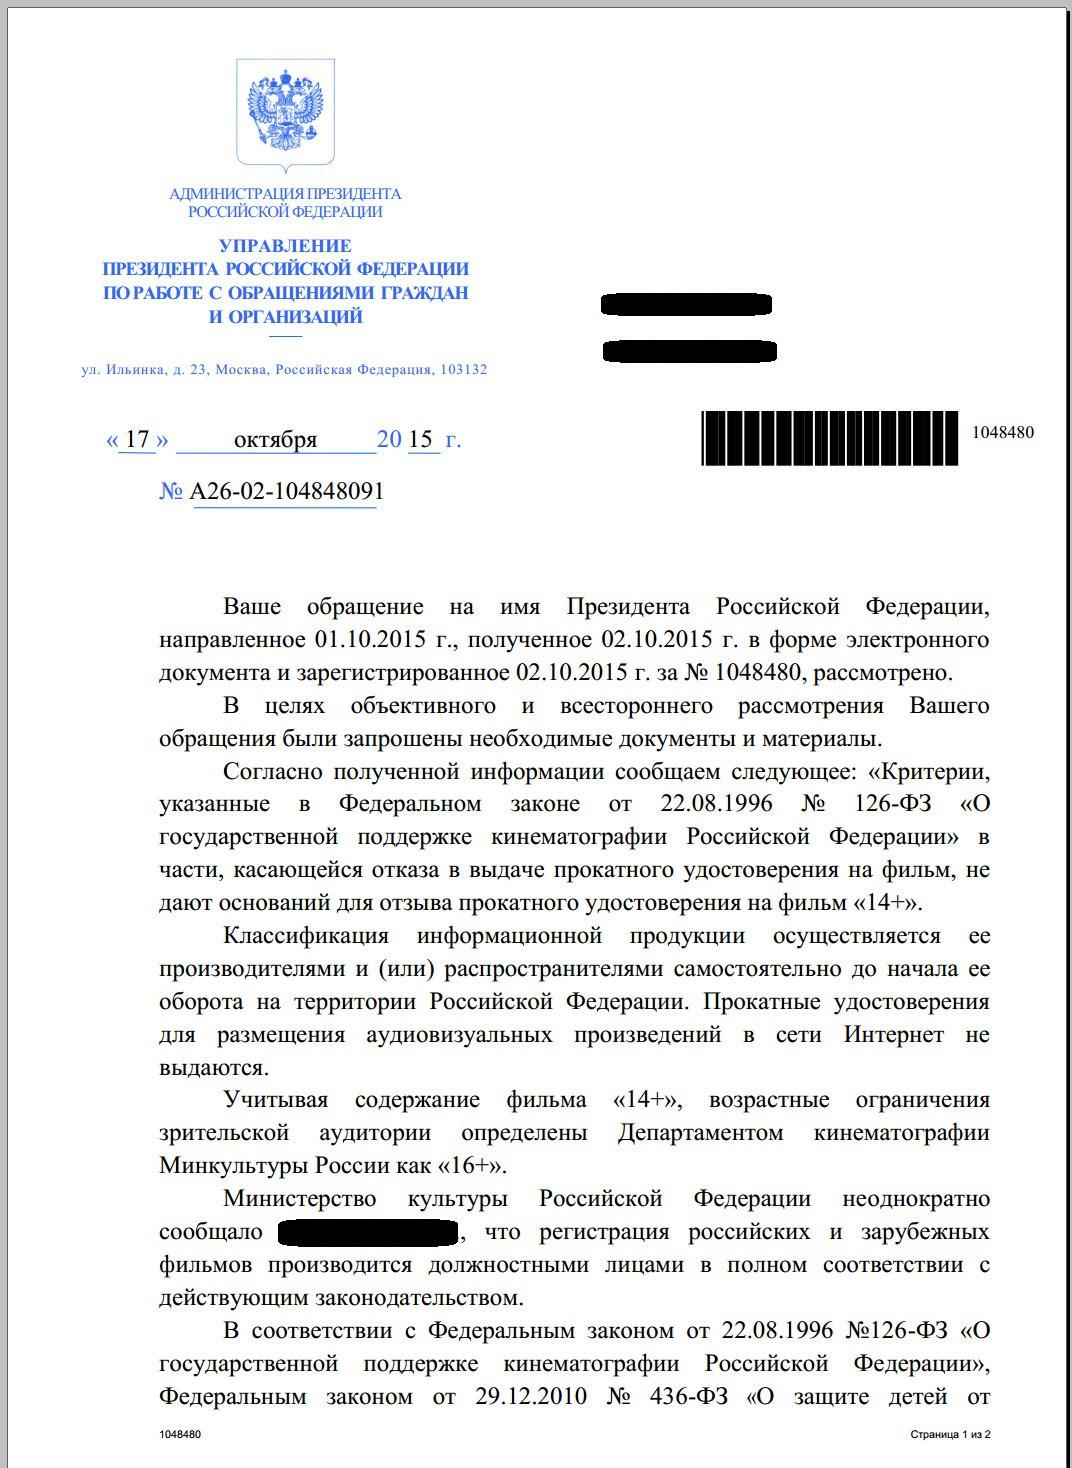 obrashhenie protiv filma 14 po priznakam razvratnyx dejstvij Системный взгляд на российский кинематограф